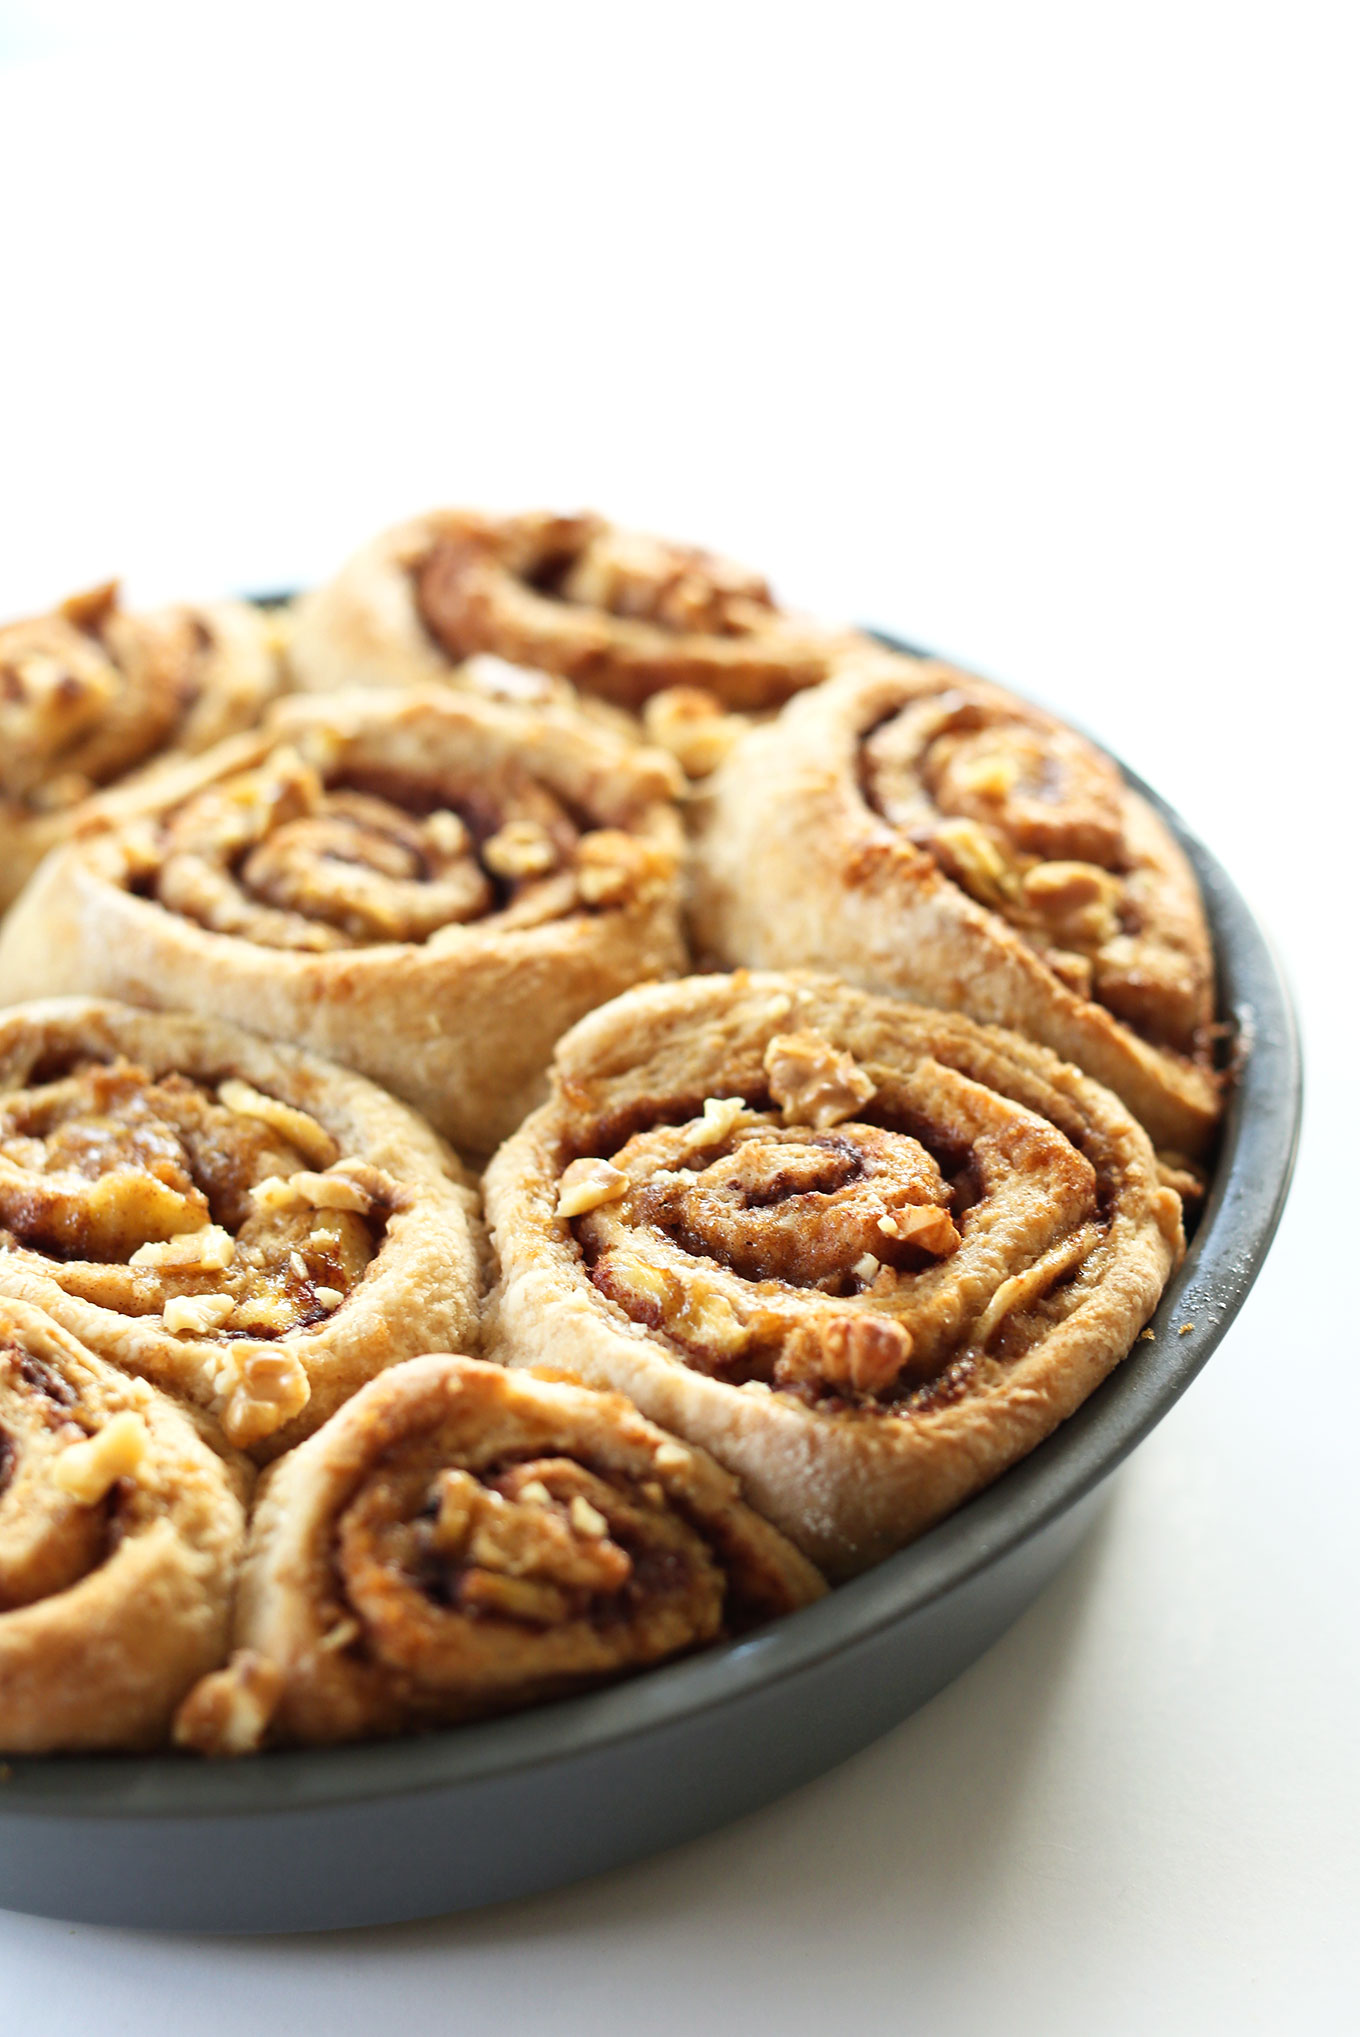 Pan of our amazing 1-Bowl Vegan Banana Bread Cinnamon Rolls recipe